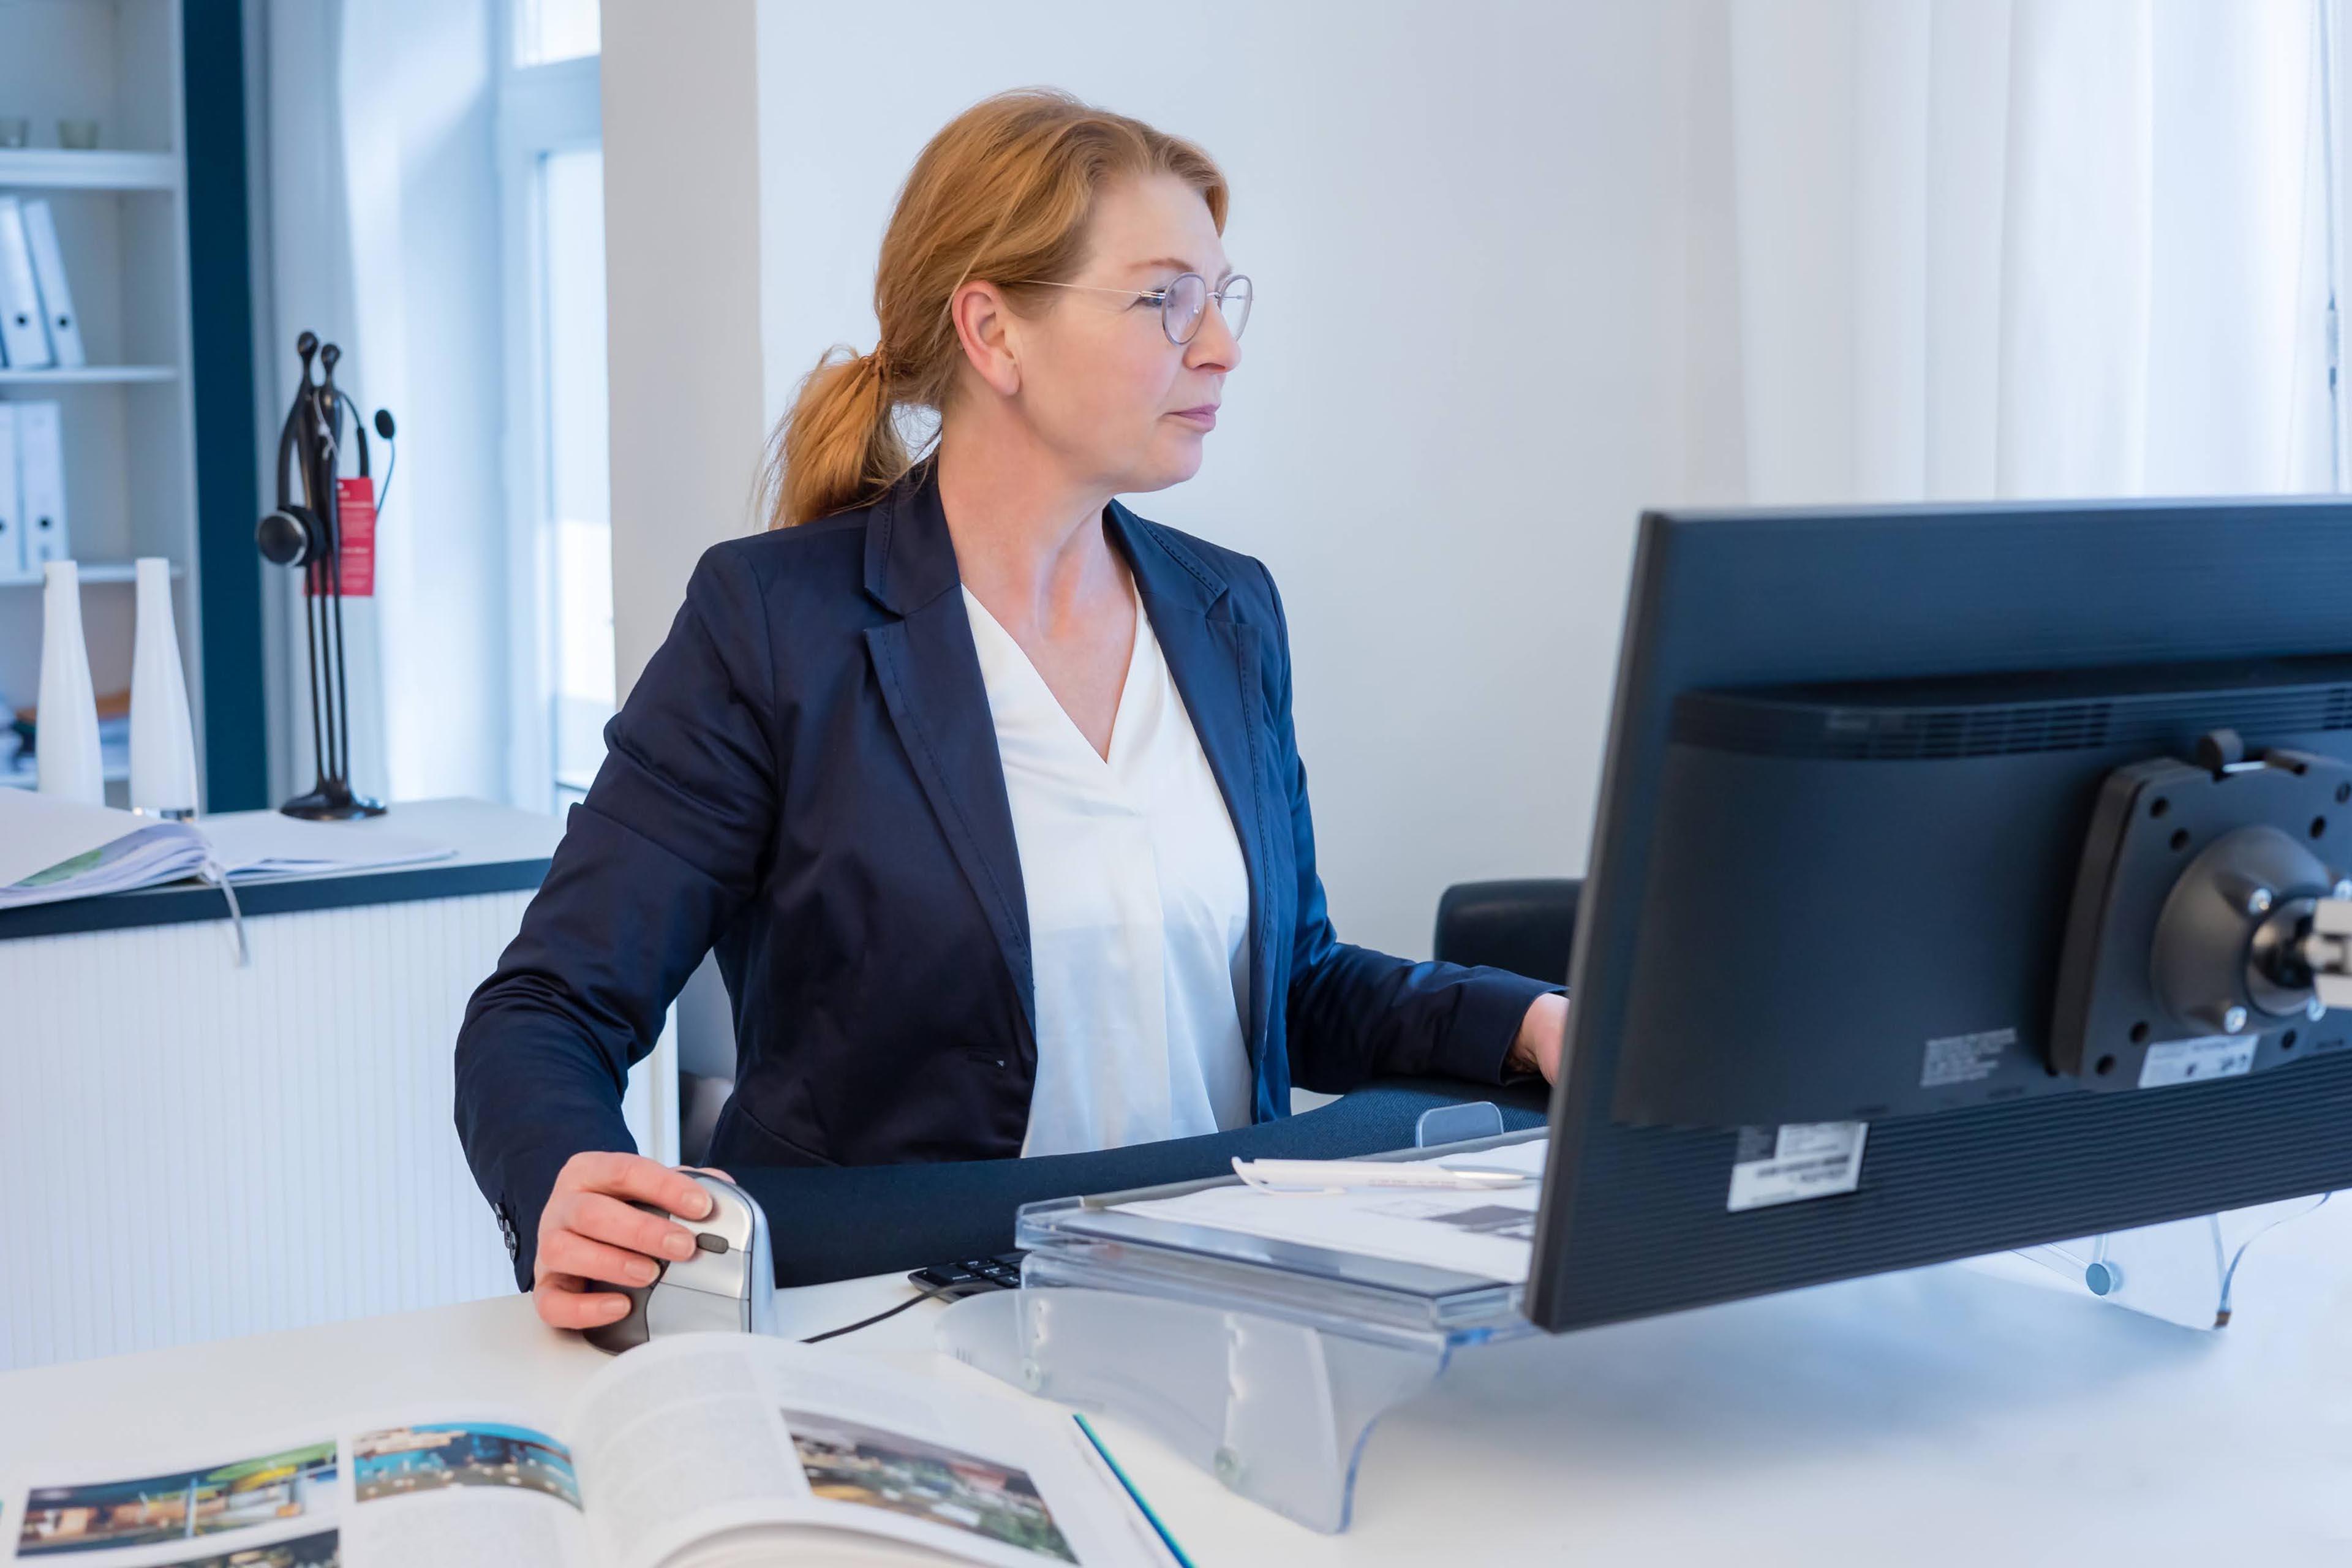 wermke bürokonzepte | Katrin Wermke bei der Arbeit